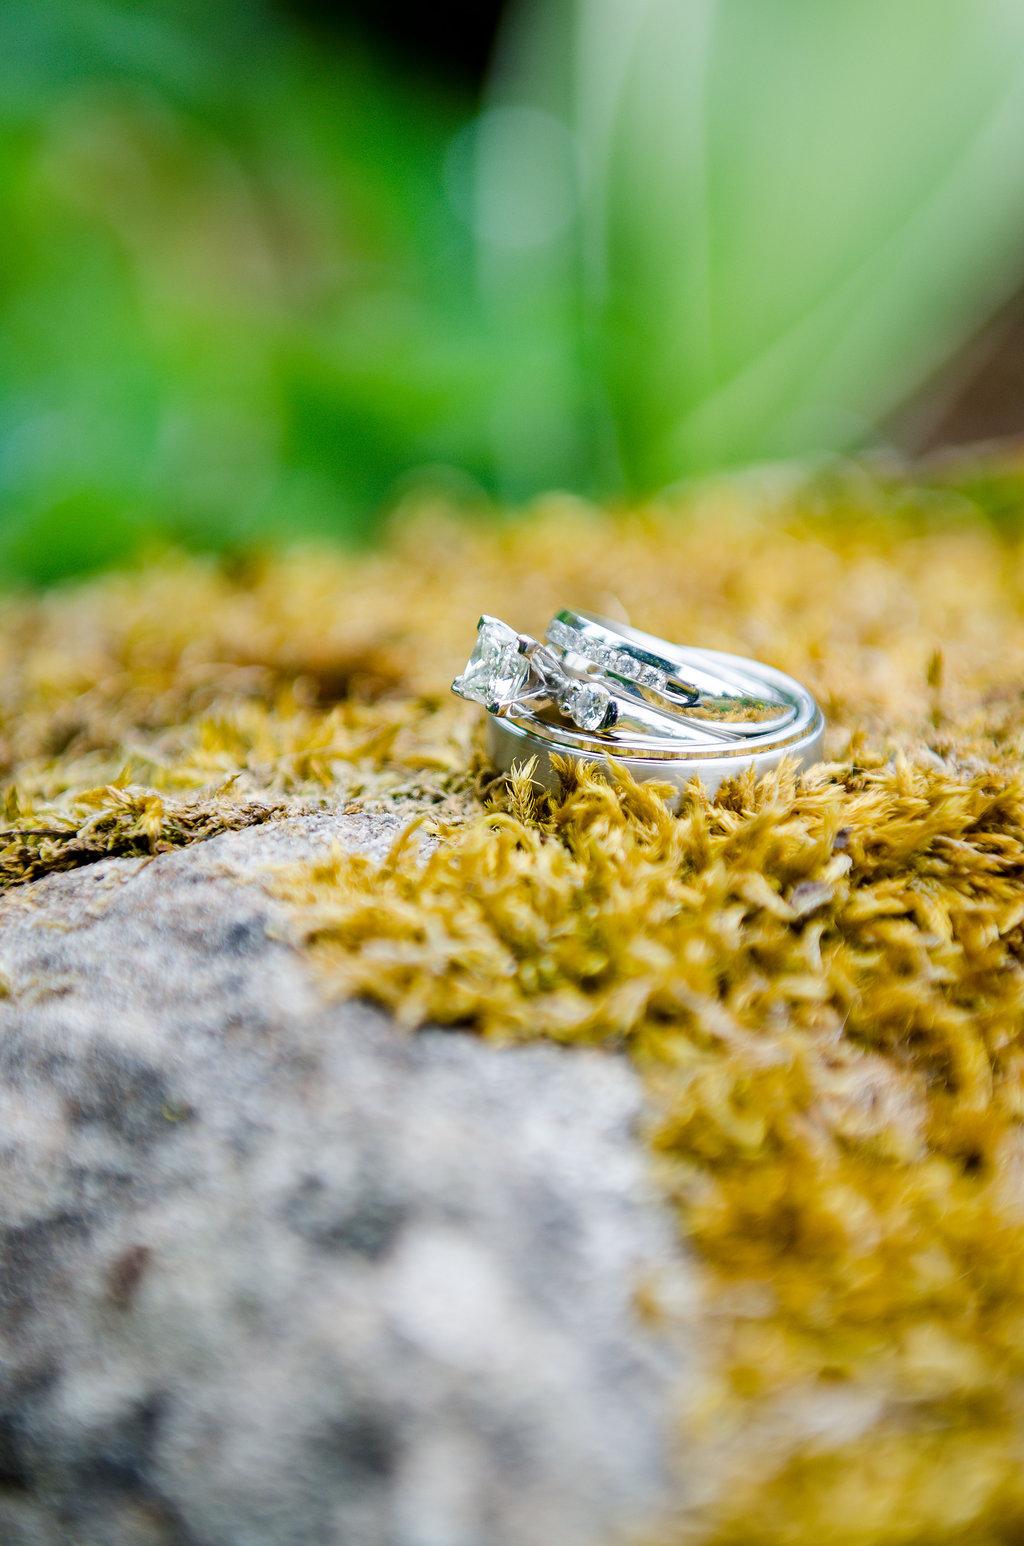 Danny-May-Wedding-Rings-Sheryl-Bale-Photography.jpg